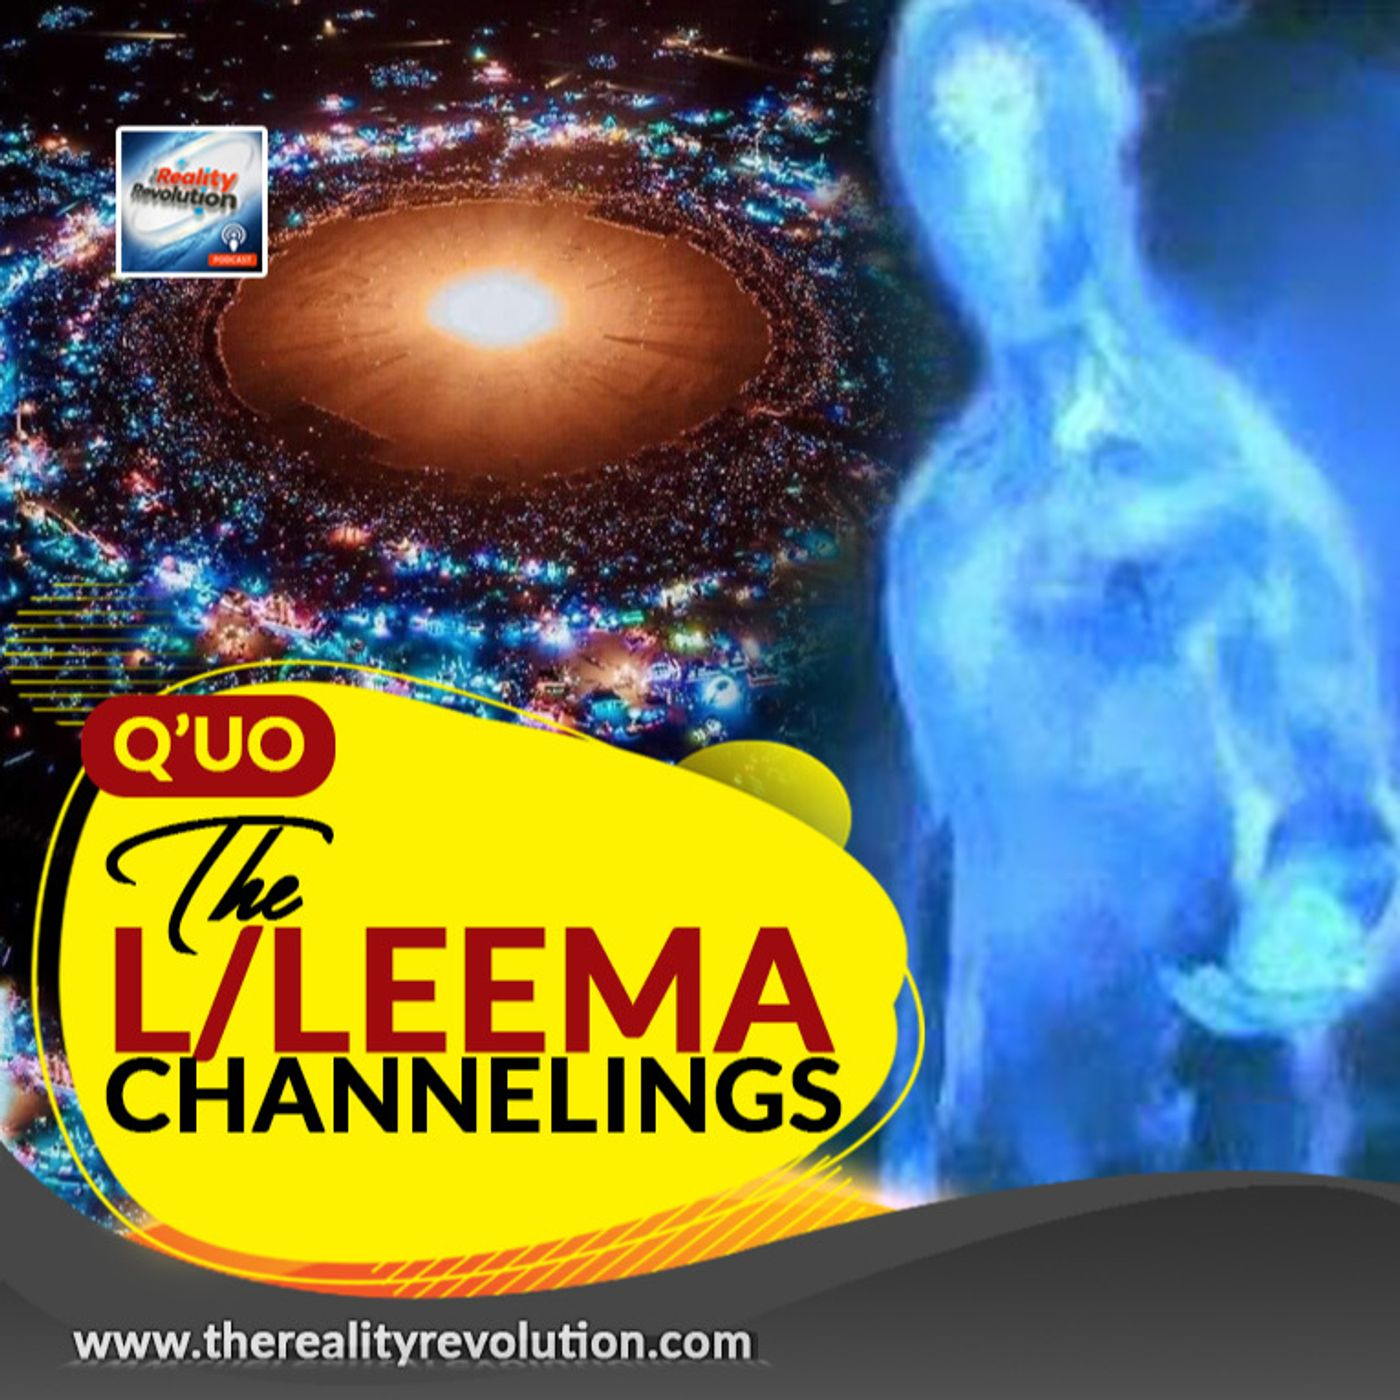 Q'uo - The L/Leema Channelings